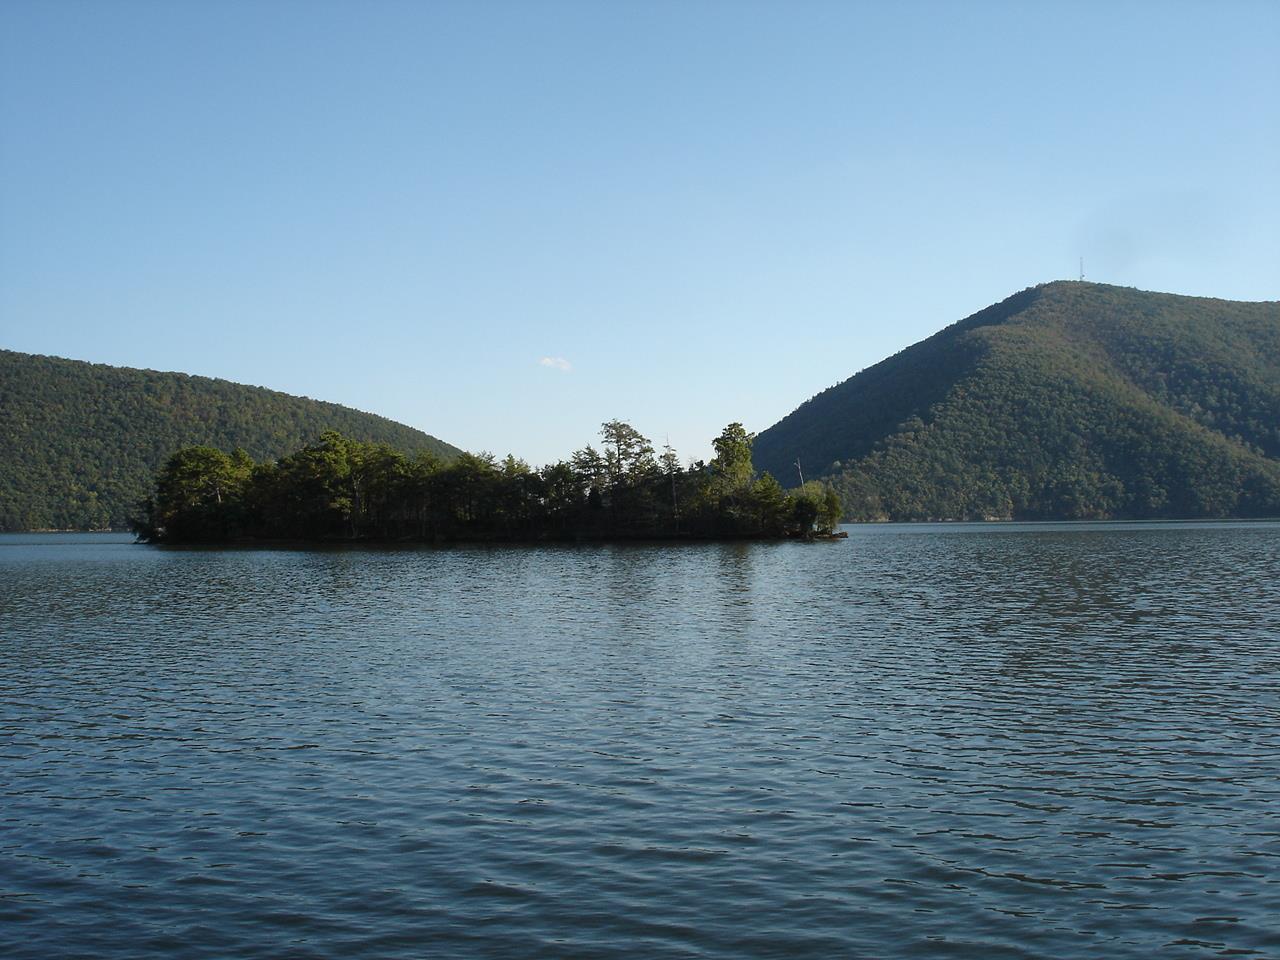 Smith Mountain Lake, Virginia